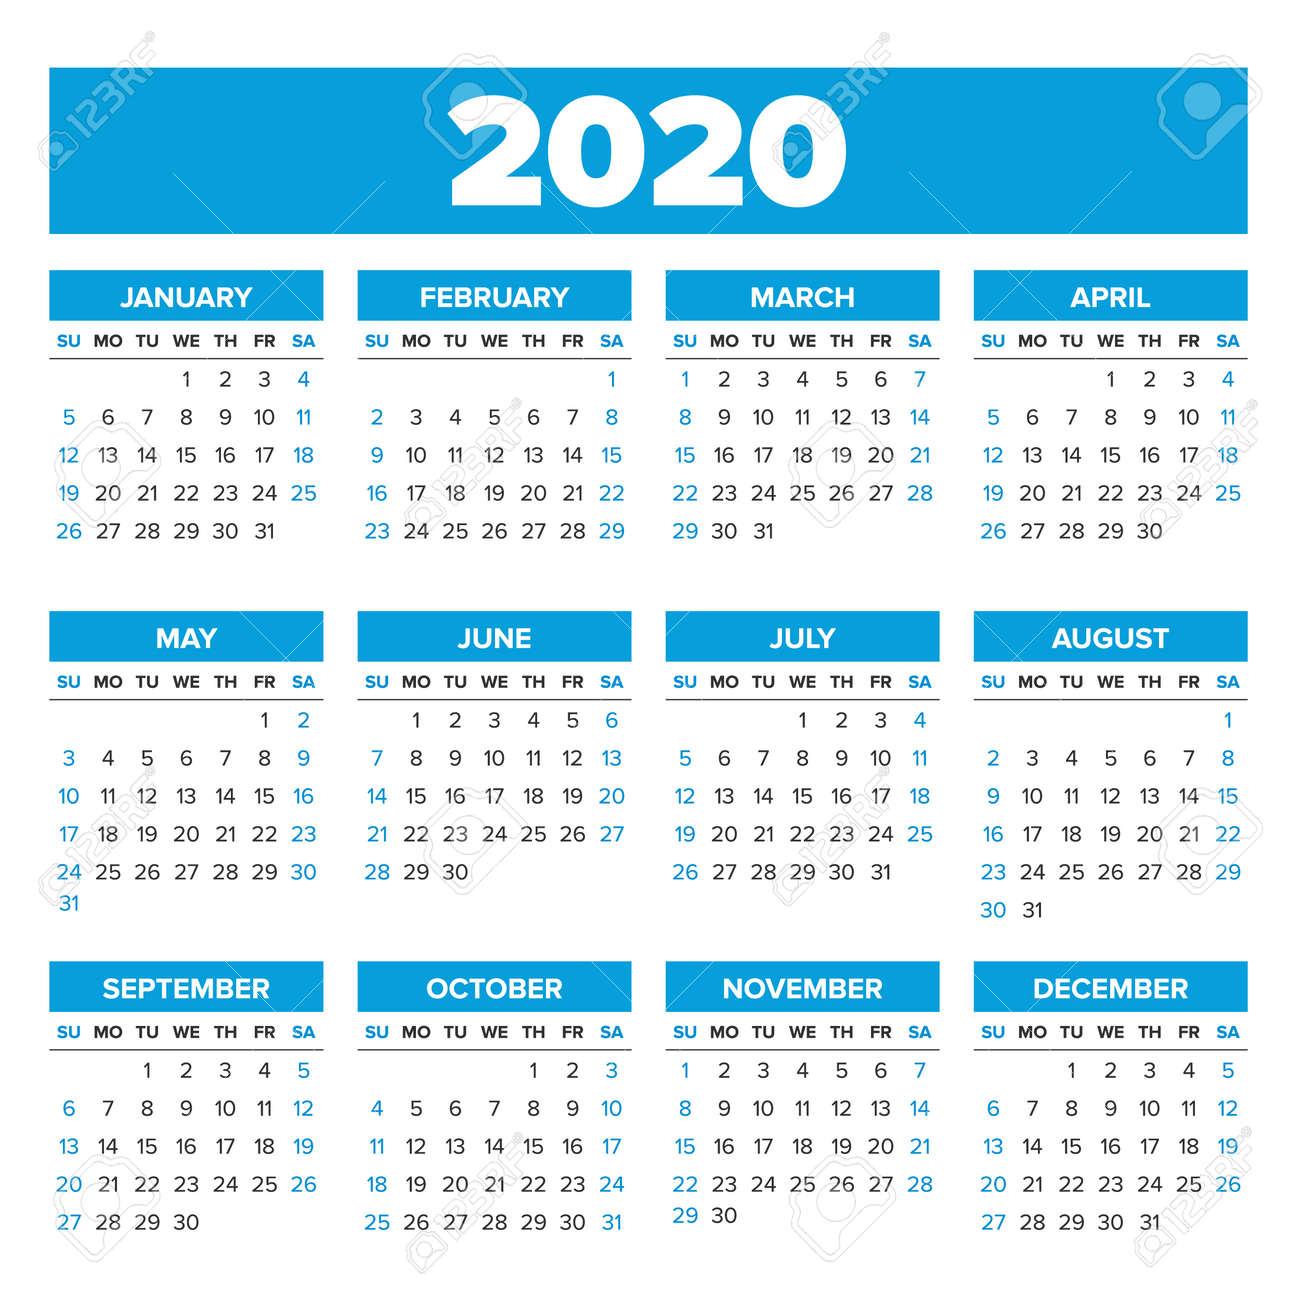 Calendario 2020 Con Foto.Simple 2020 Year Calendar Week Starts On Sunday